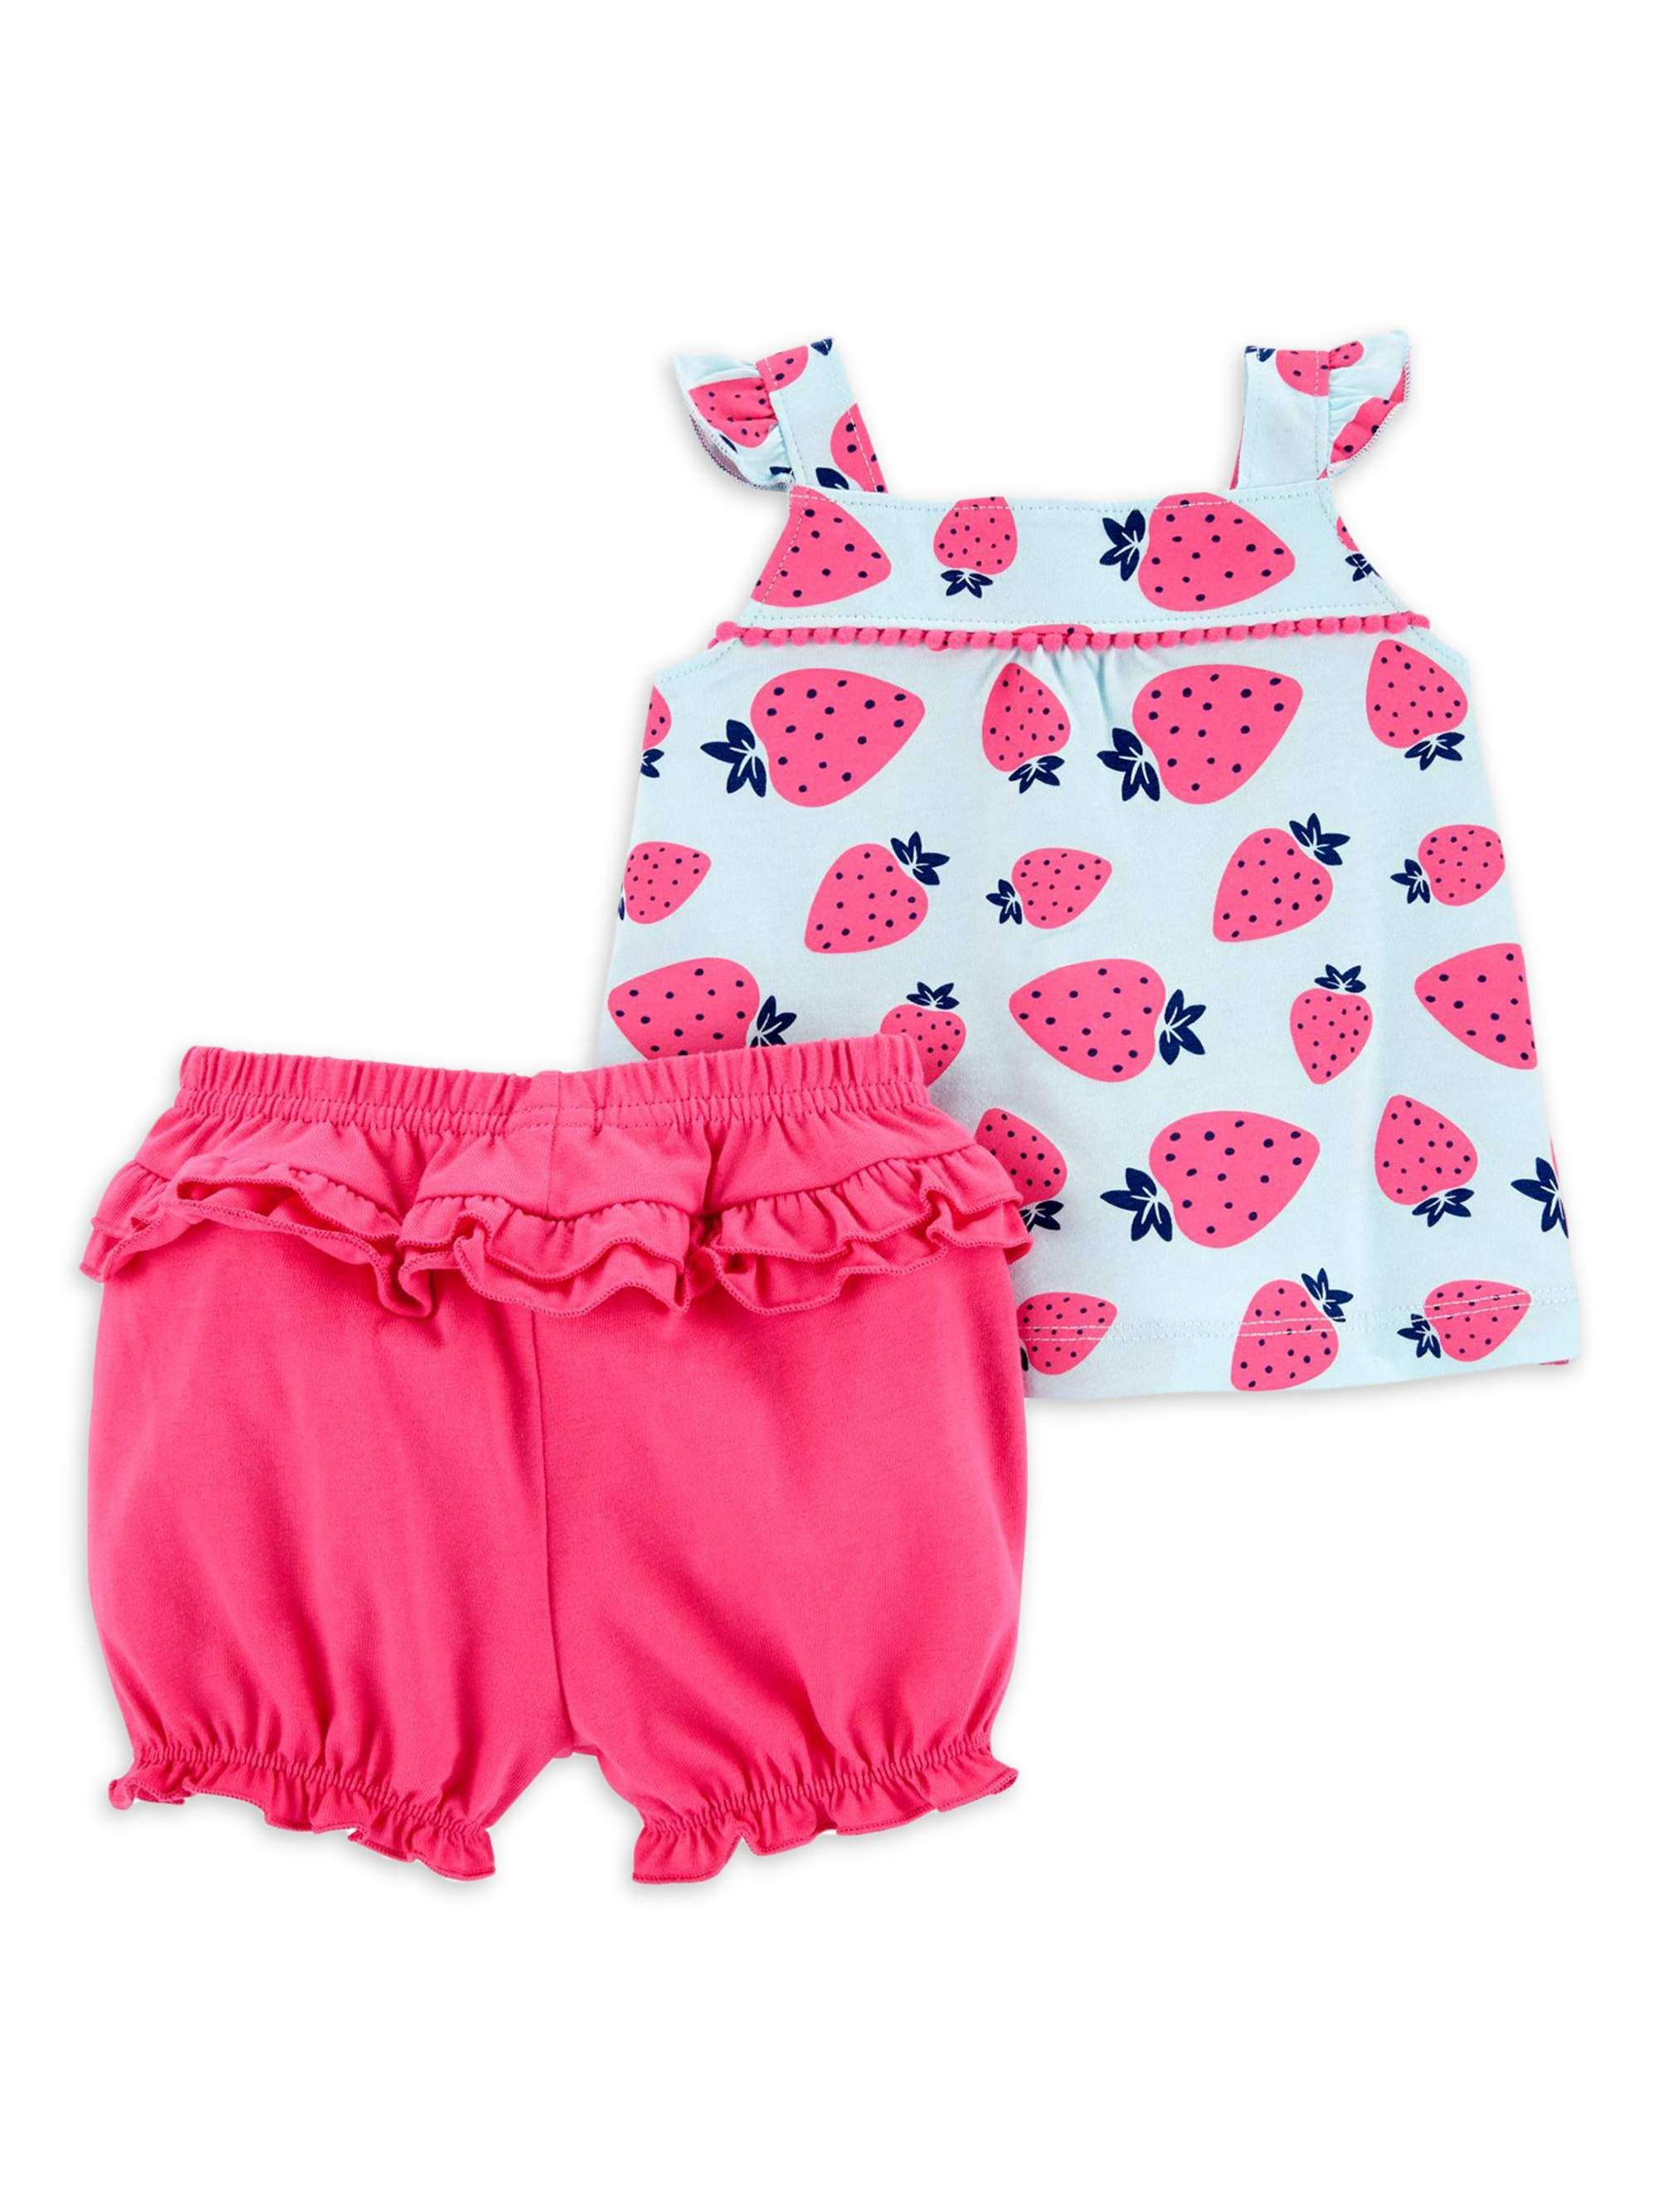 Carters Baby Girl 2-Piece Bear Fleece Top Floral Legging Set 2pc 18 24 Months